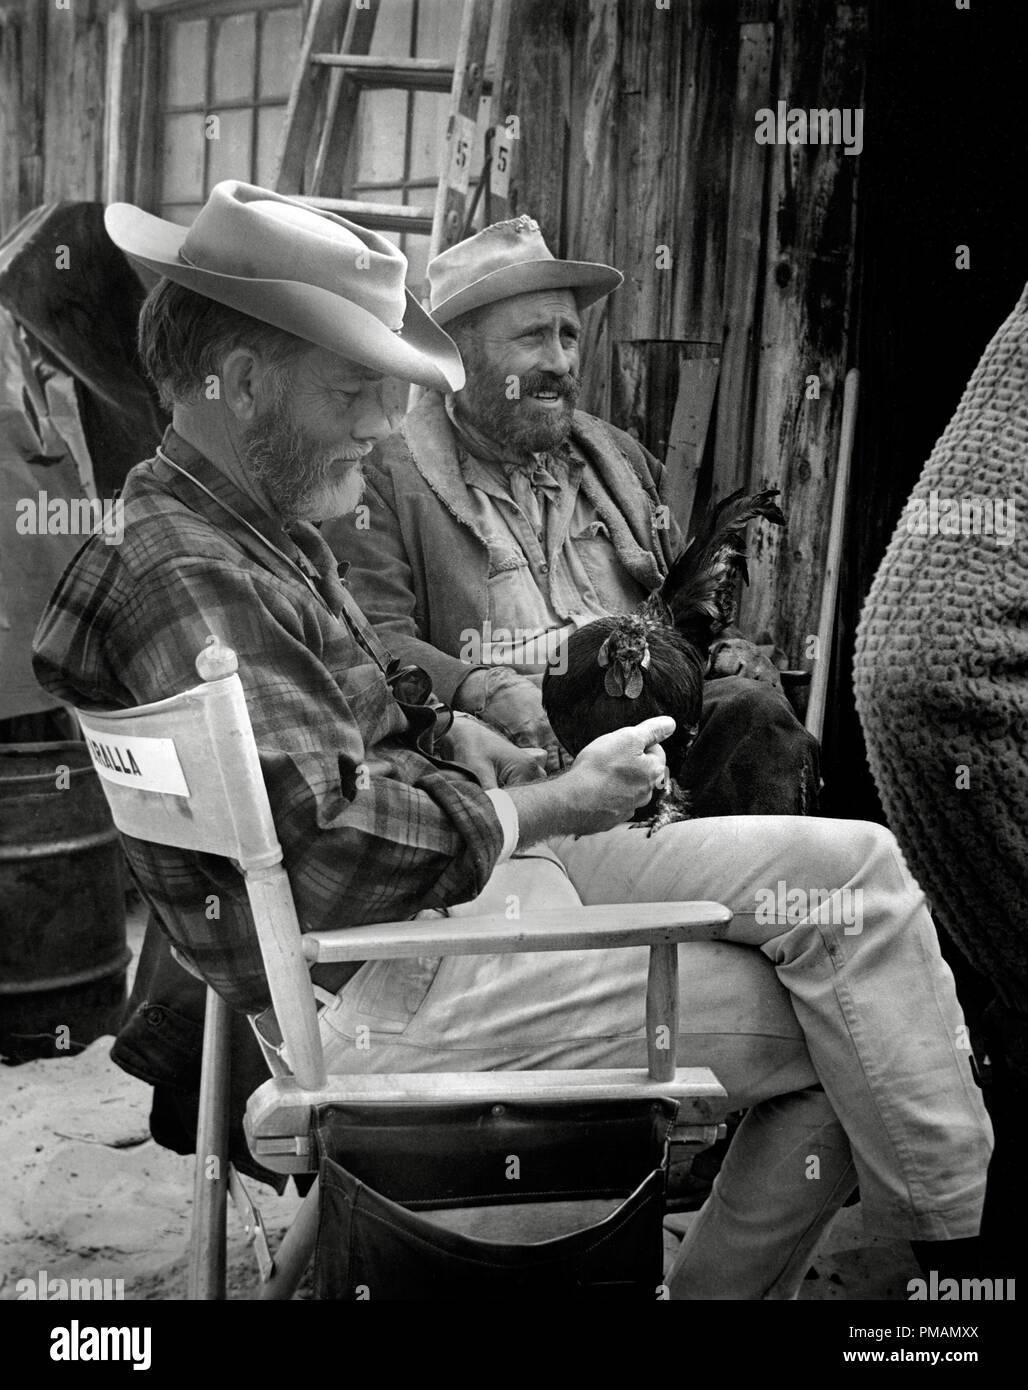 Sam Peckinpah portrait